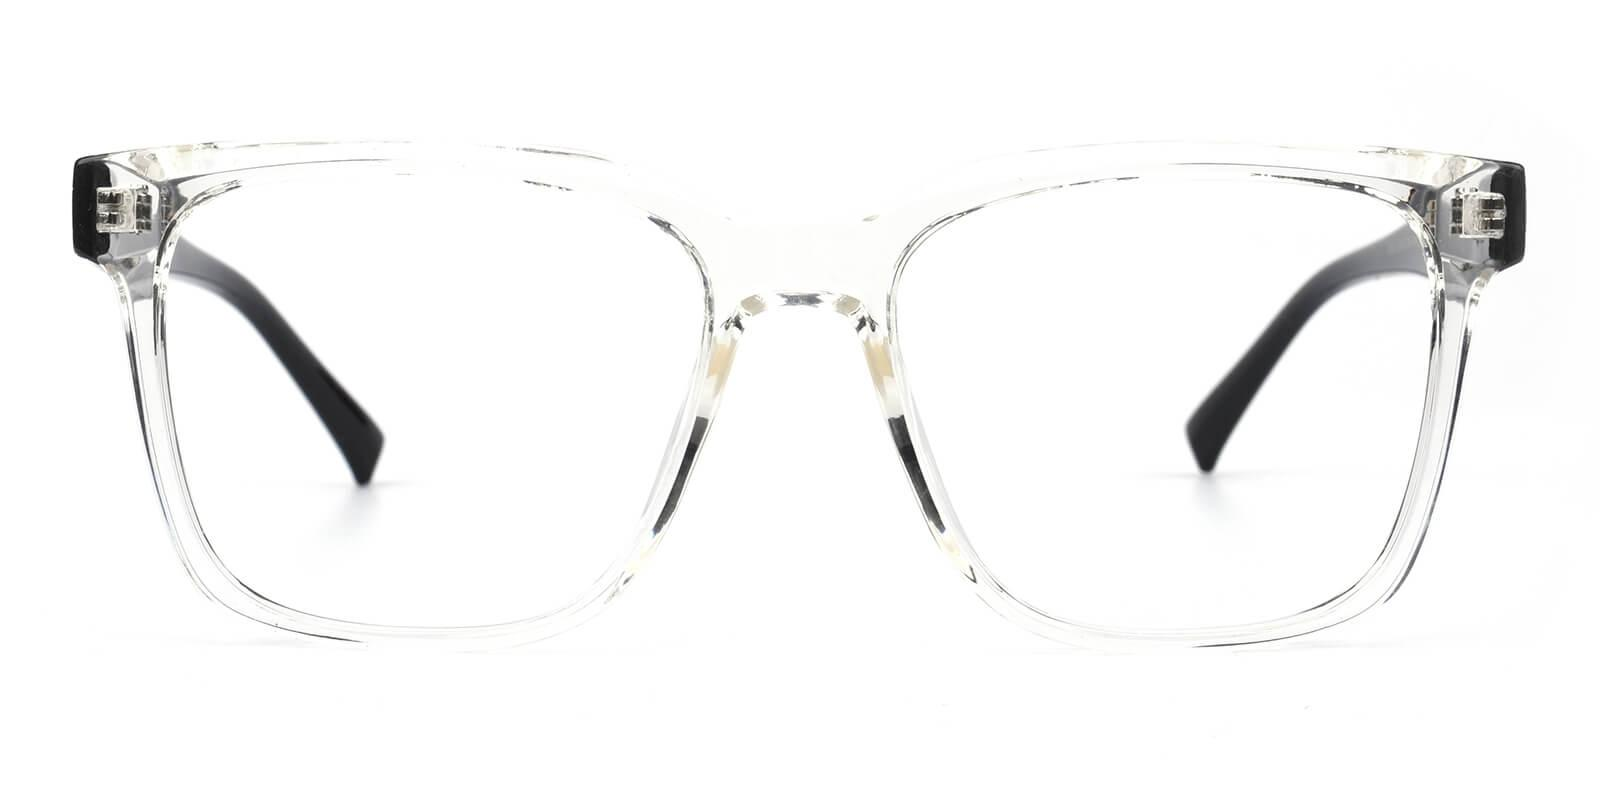 Enza-Translucent-Square-TR-Eyeglasses-detail